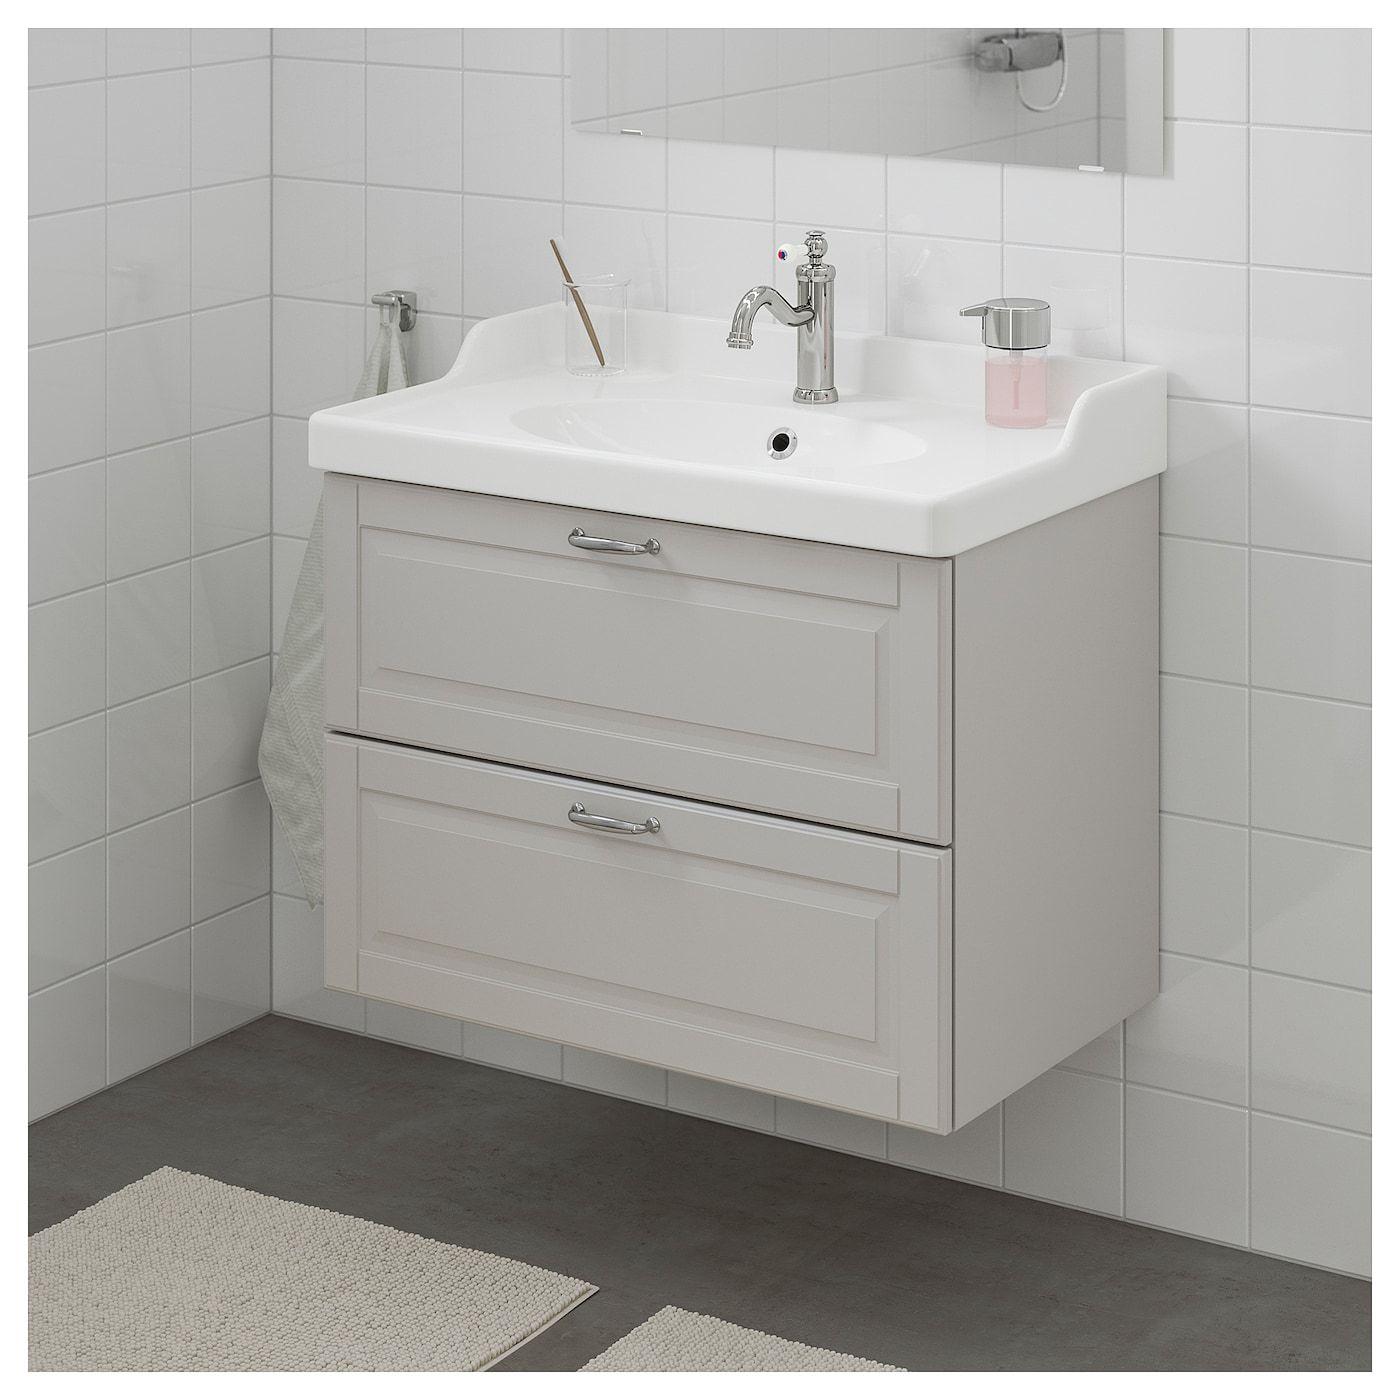 Ikea Godmorgon Rattviken Bathroom Vanity Kasjon Light Gray